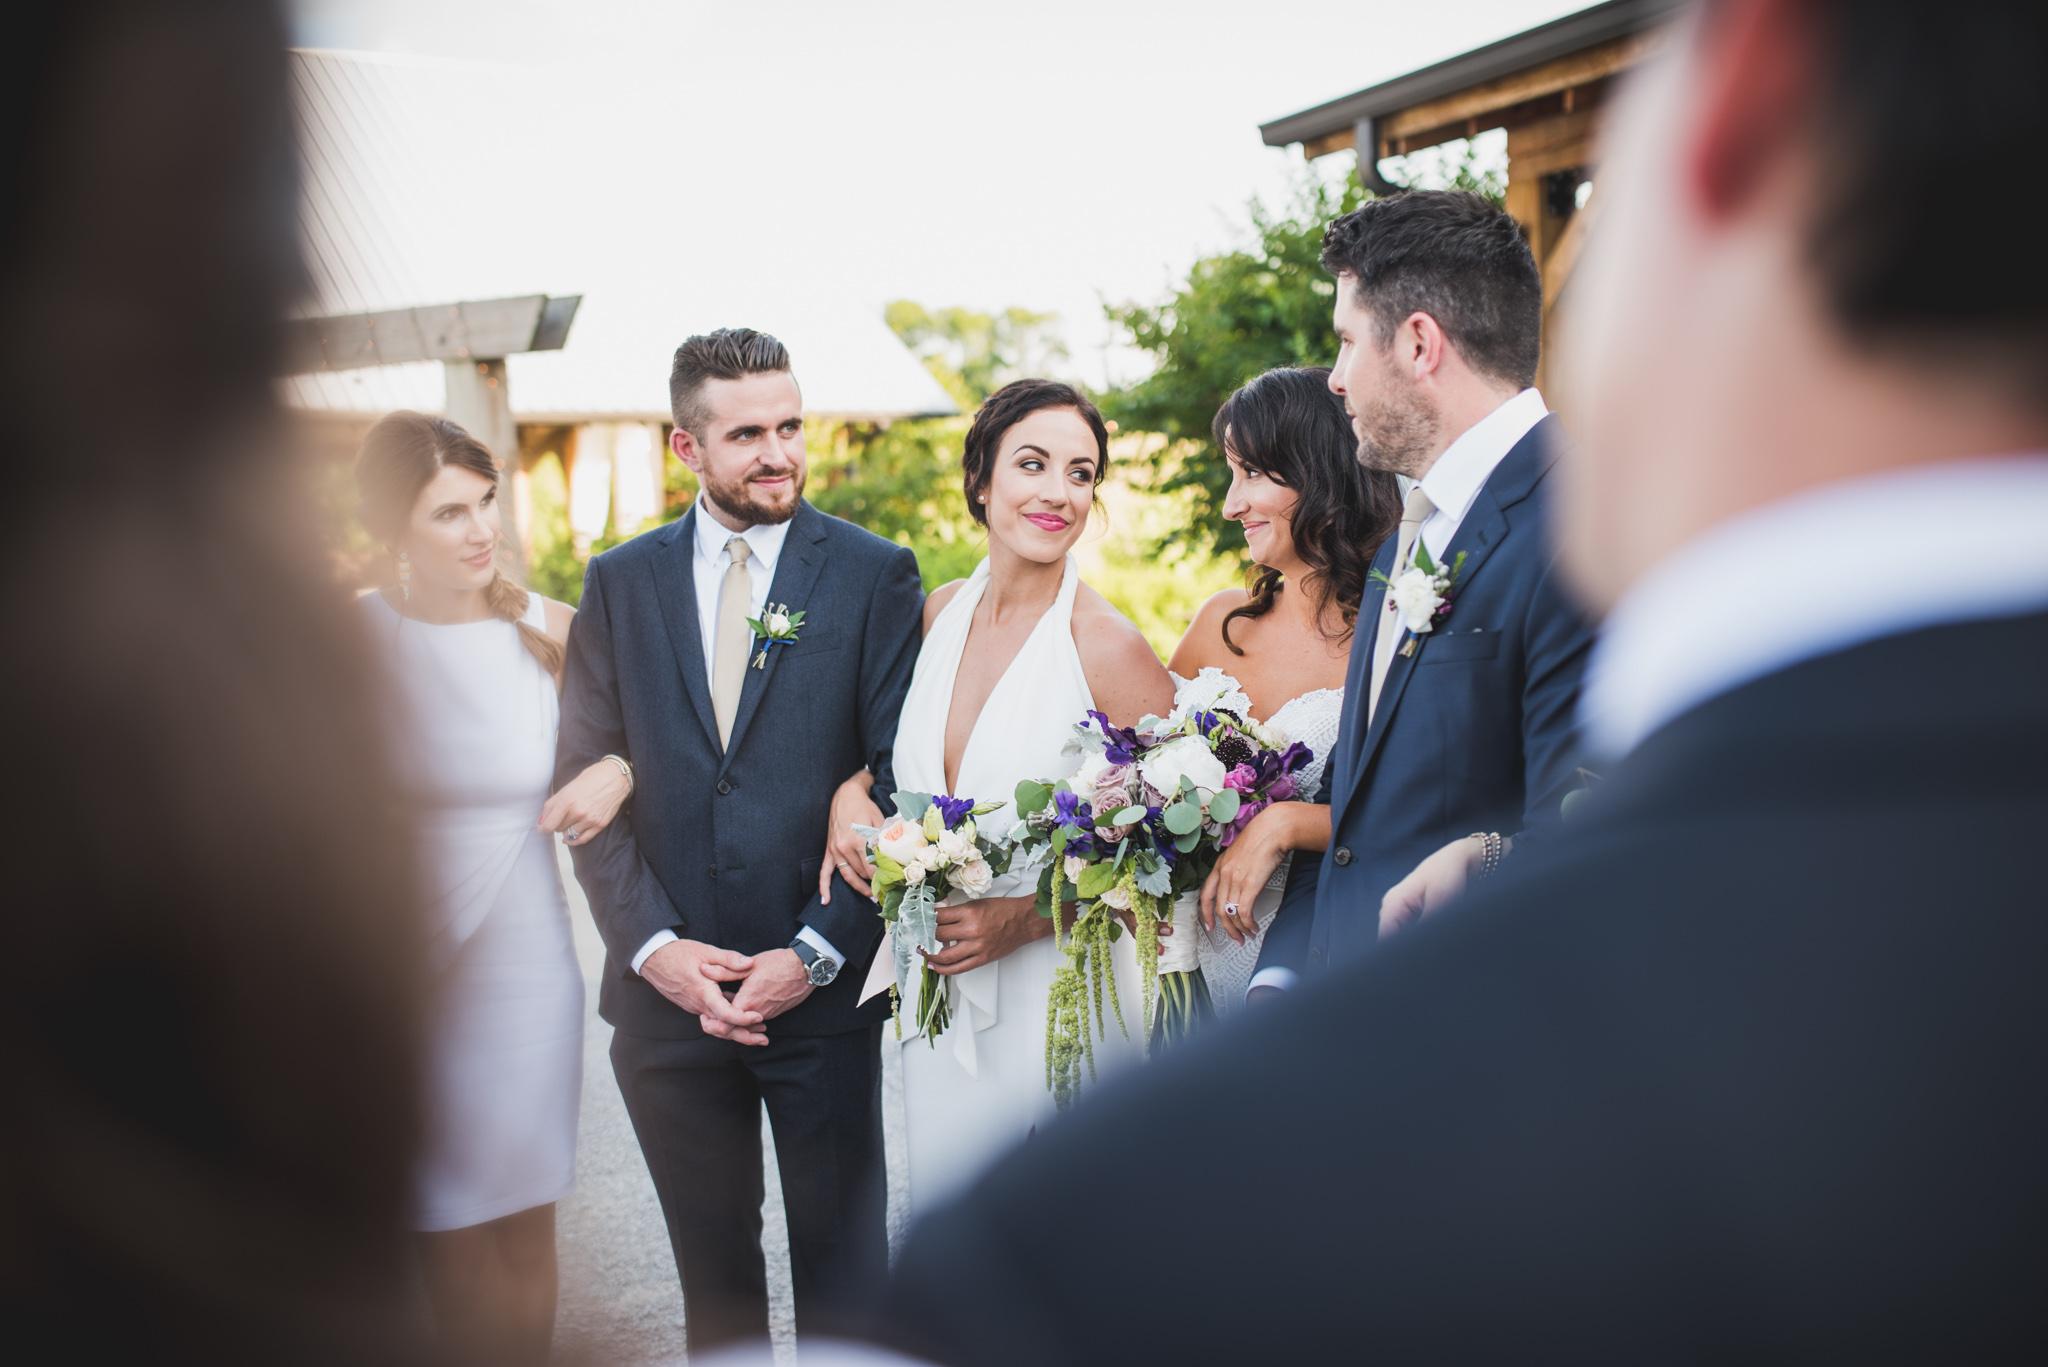 Mint Springs Farm Nashville TN Wedding Photographers56.jpg